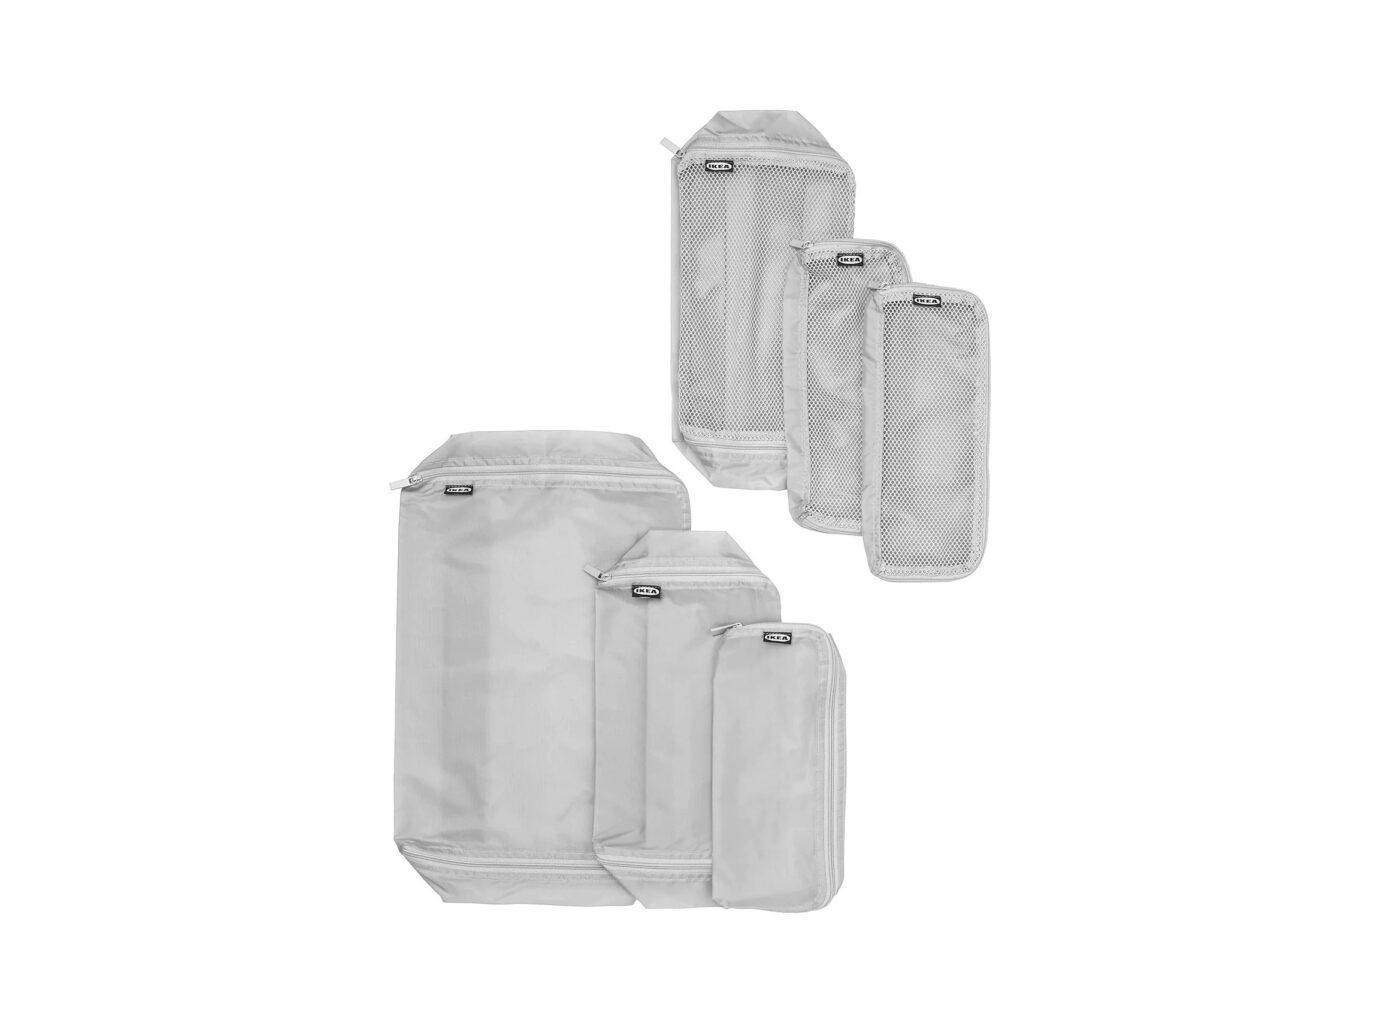 IKEA Forfina 6-piece Travel bag set